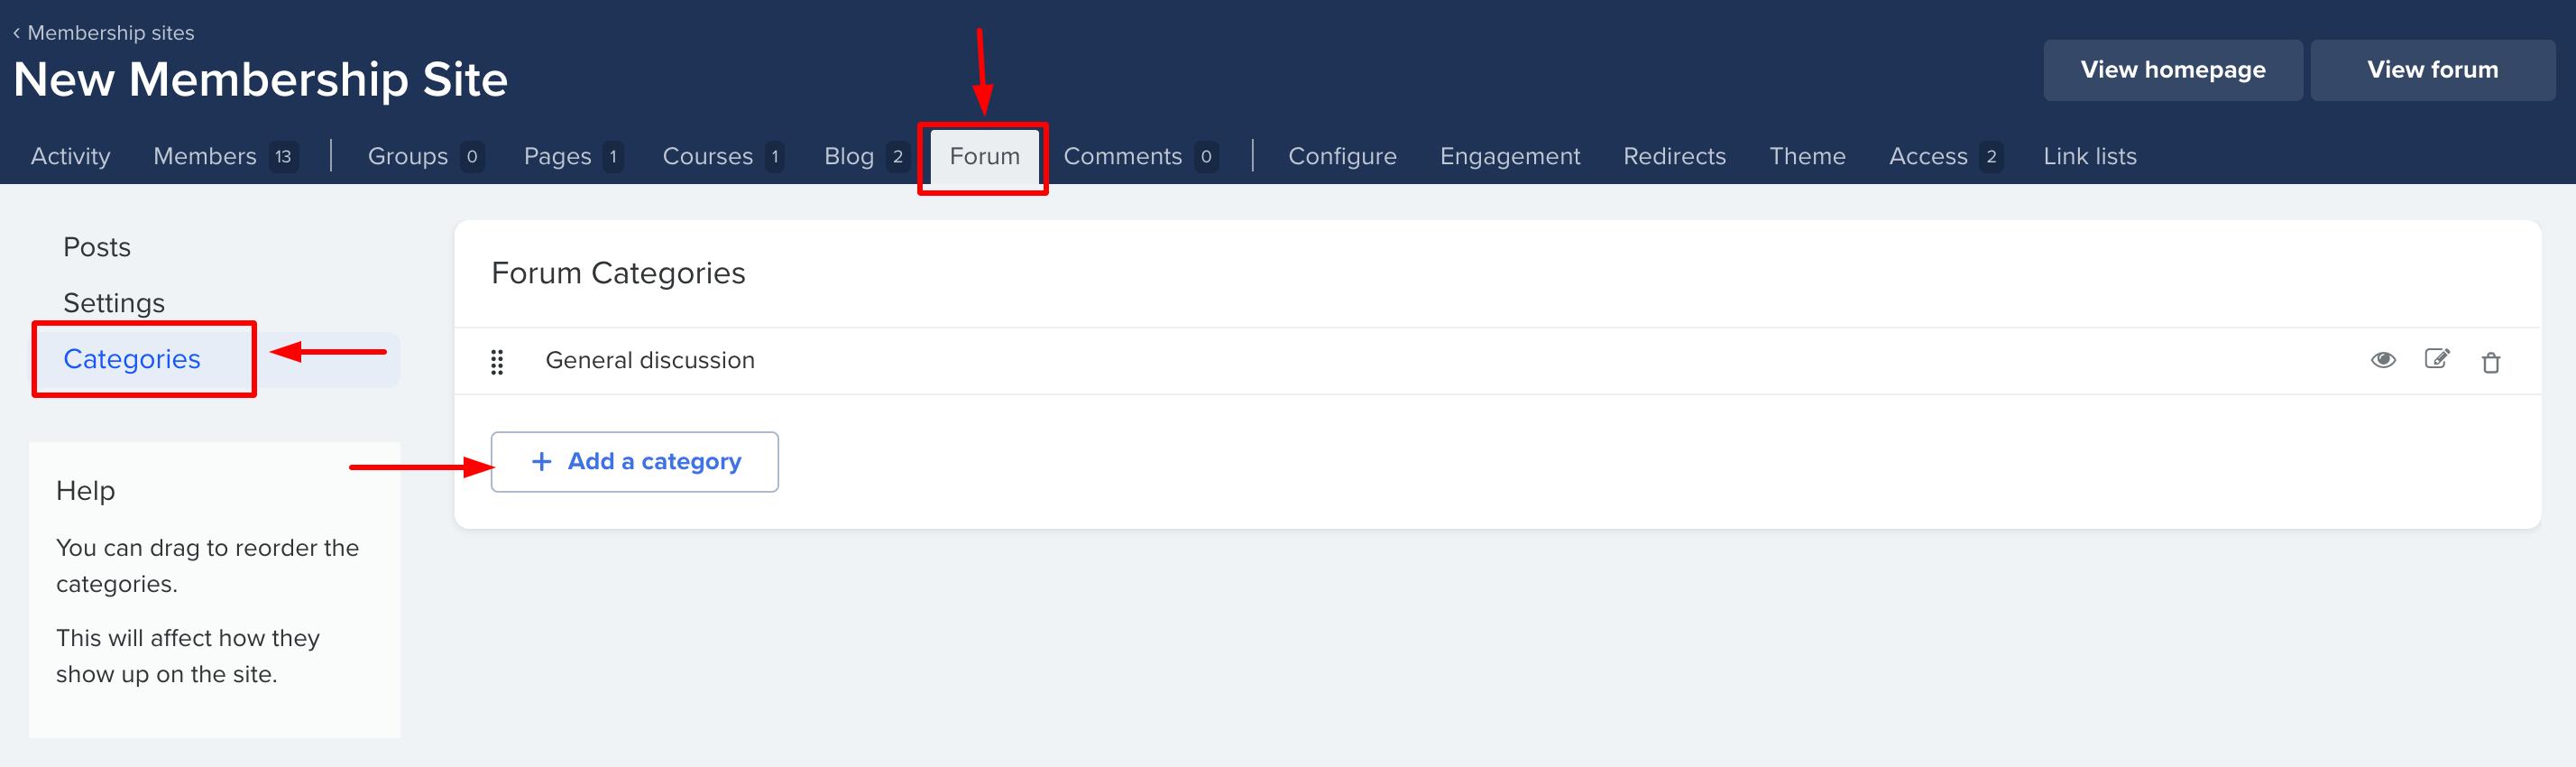 Add_a_category_in_forum